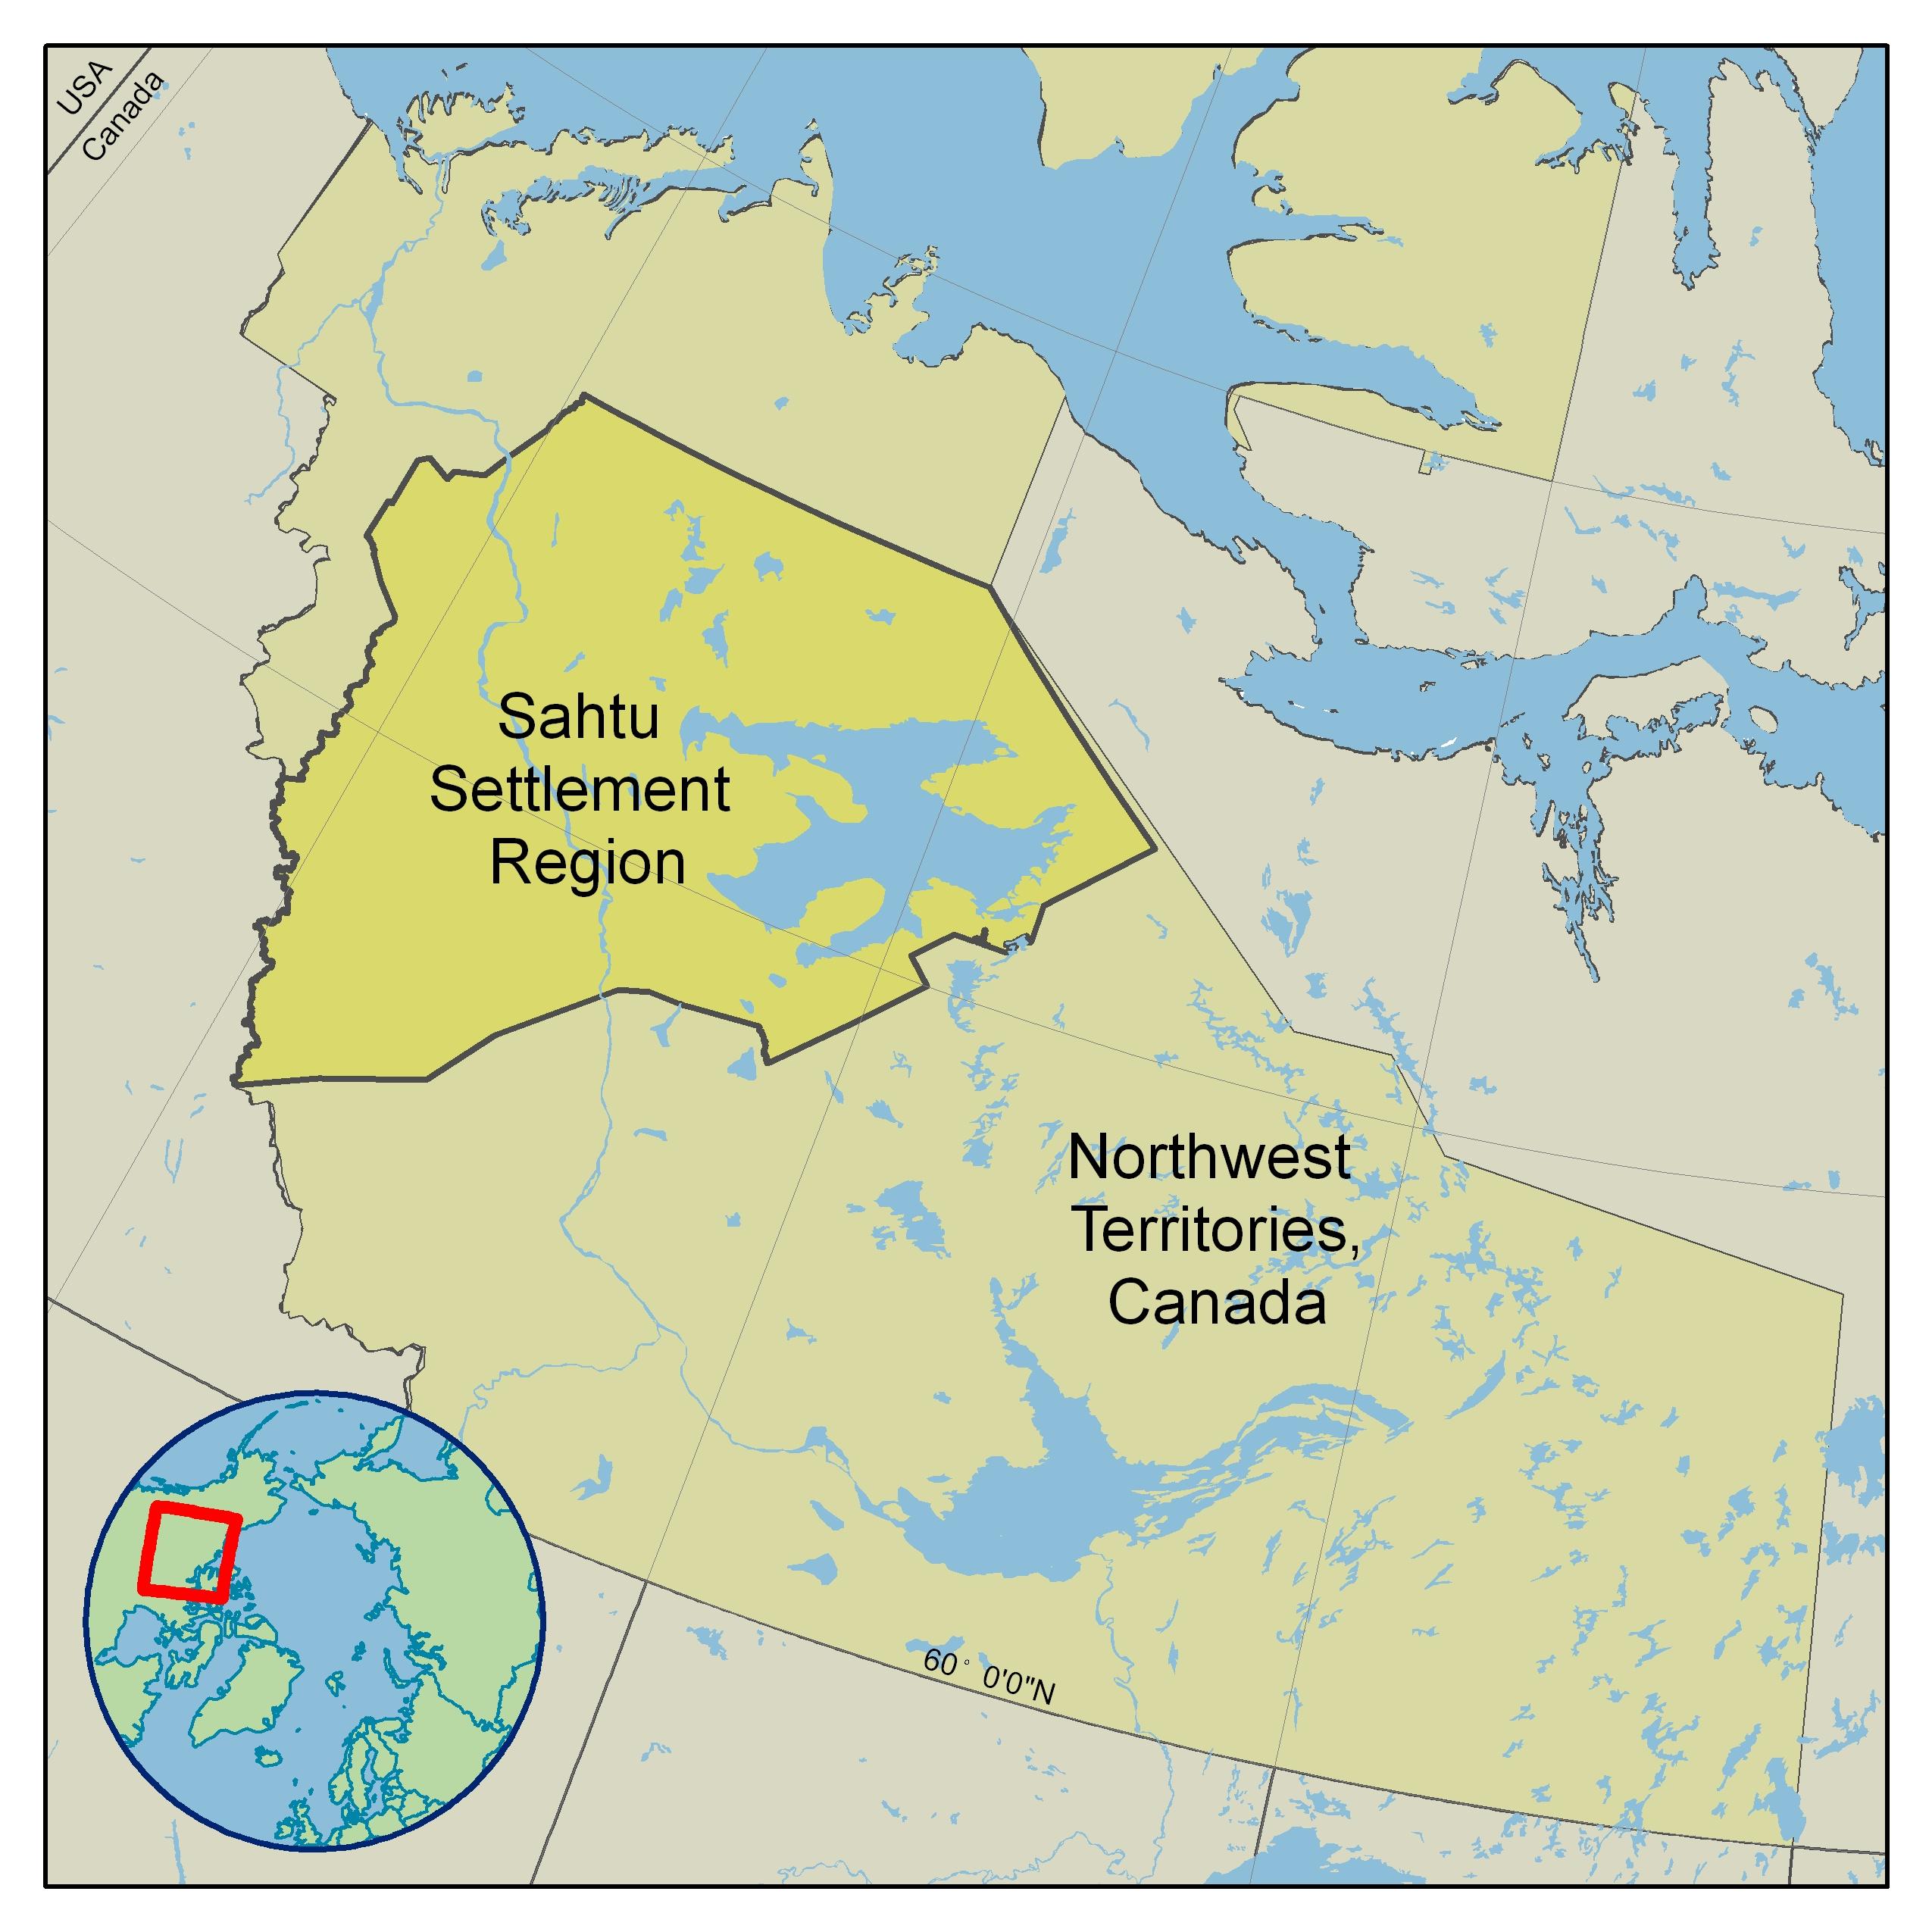 Arctic bulletin 0305 wwf a map of the sahtu region freya nales wwf canada cpaws gumiabroncs Images